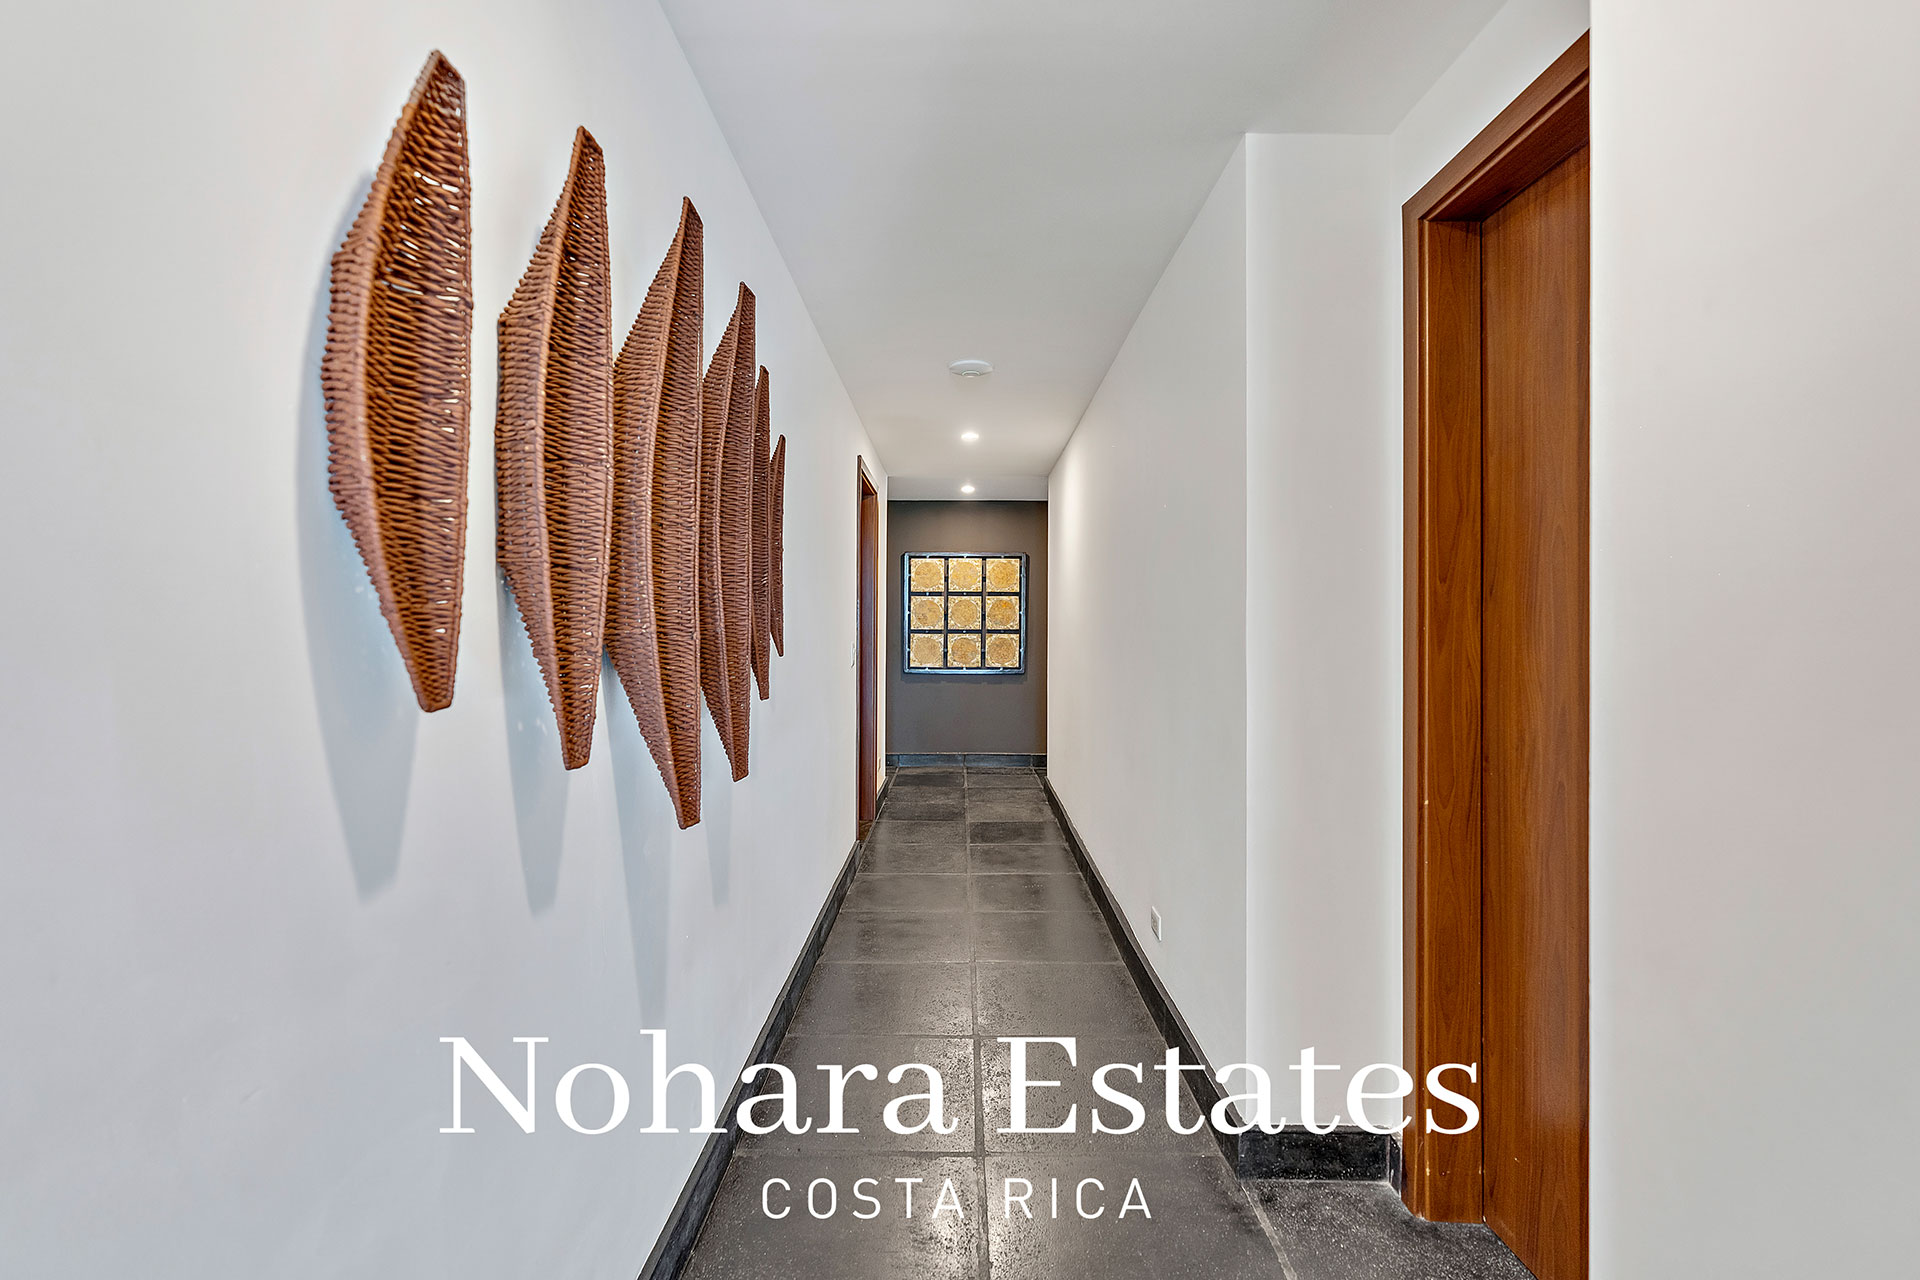 Nohara Estates Costa Rica 122 Apartment Quepos Los Altos 5